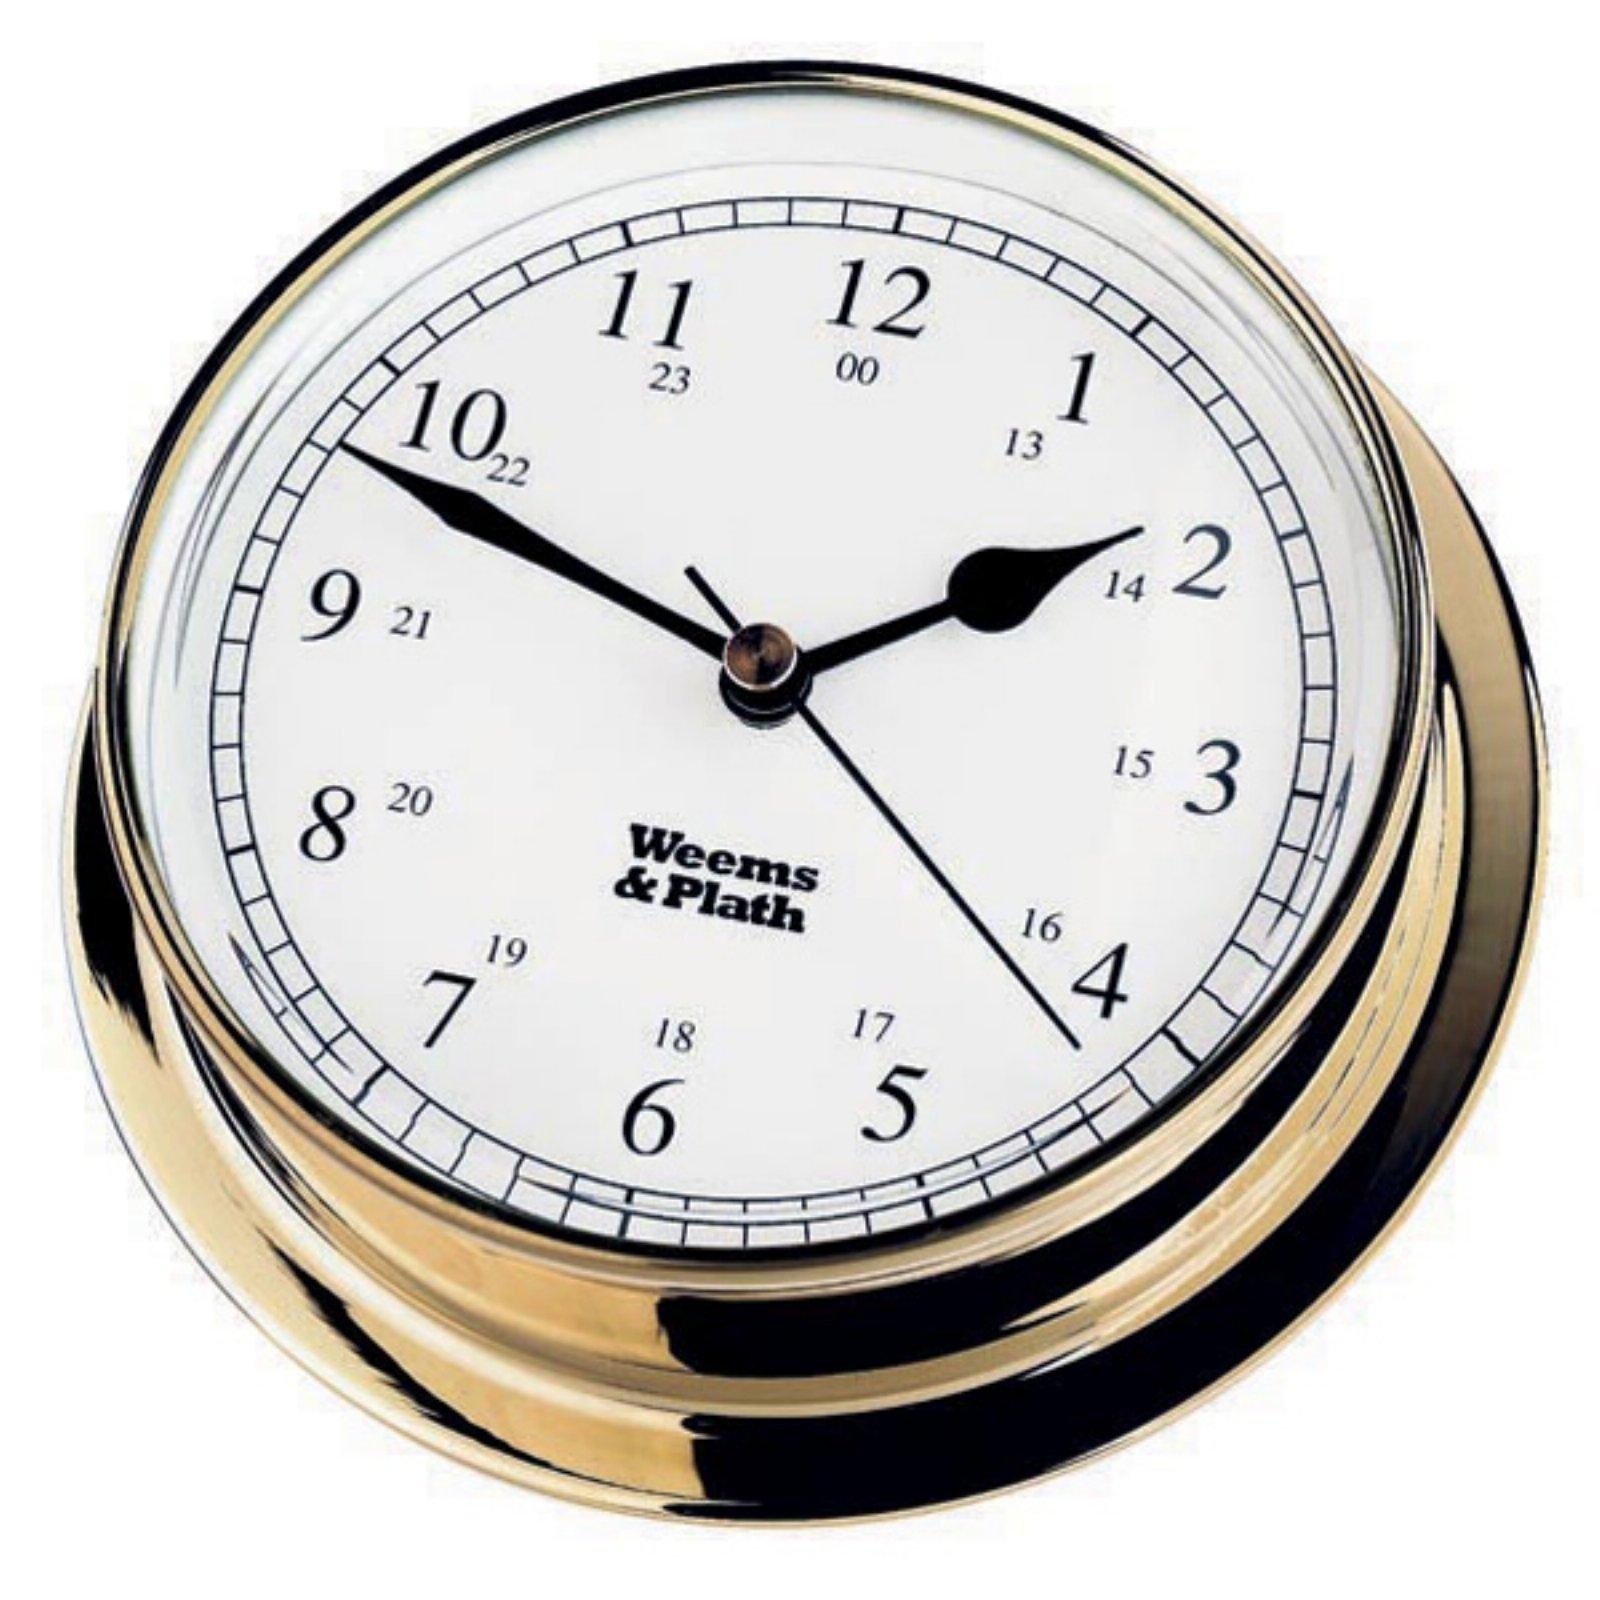 Weems and Plath Endurance 085 Clock